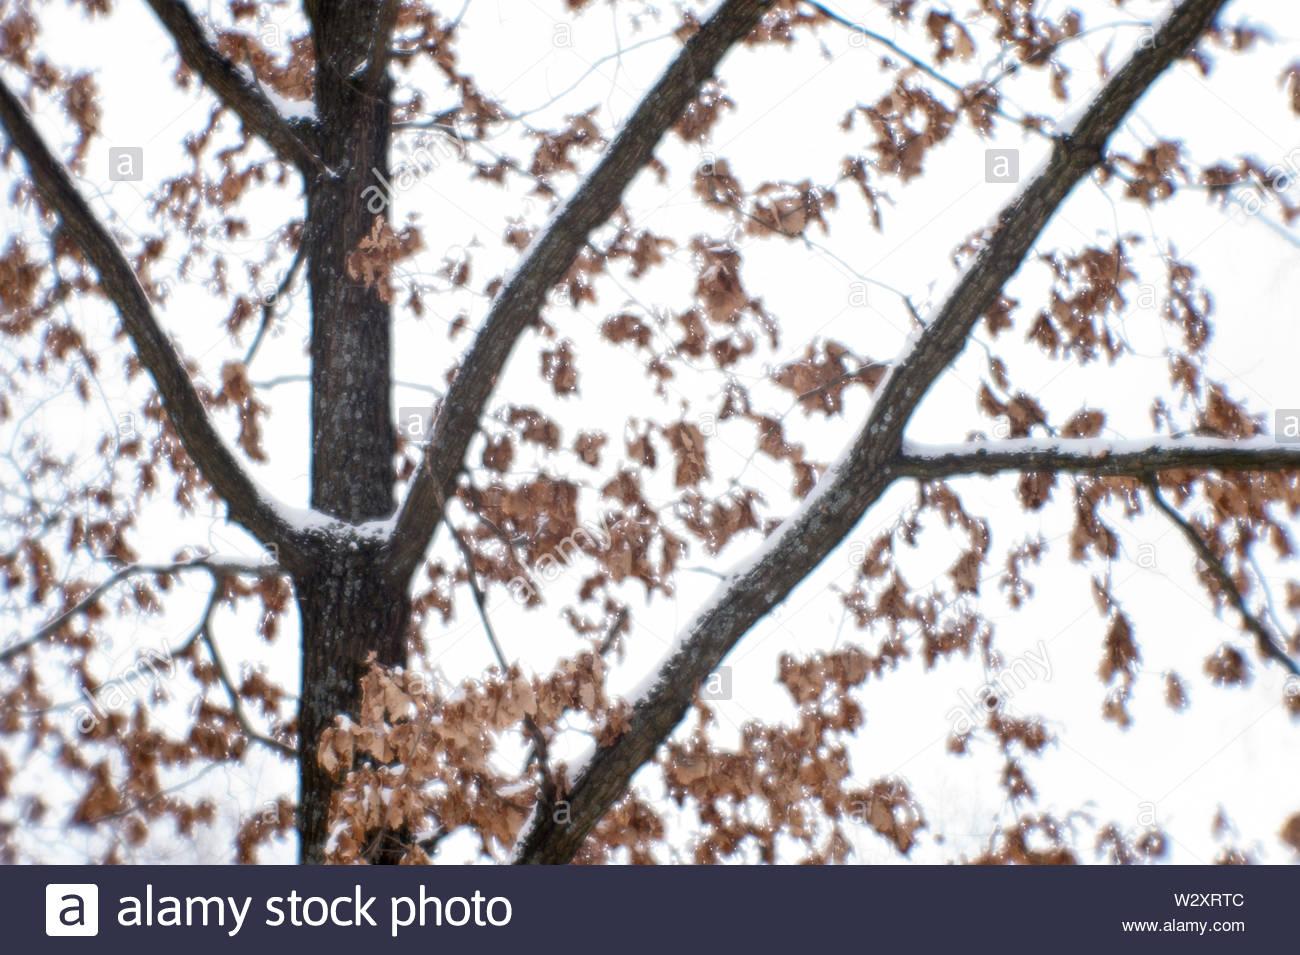 Twigs Soft Wood Stock Photos Twigs Soft Wood Stock Images   Alamy 1300x955